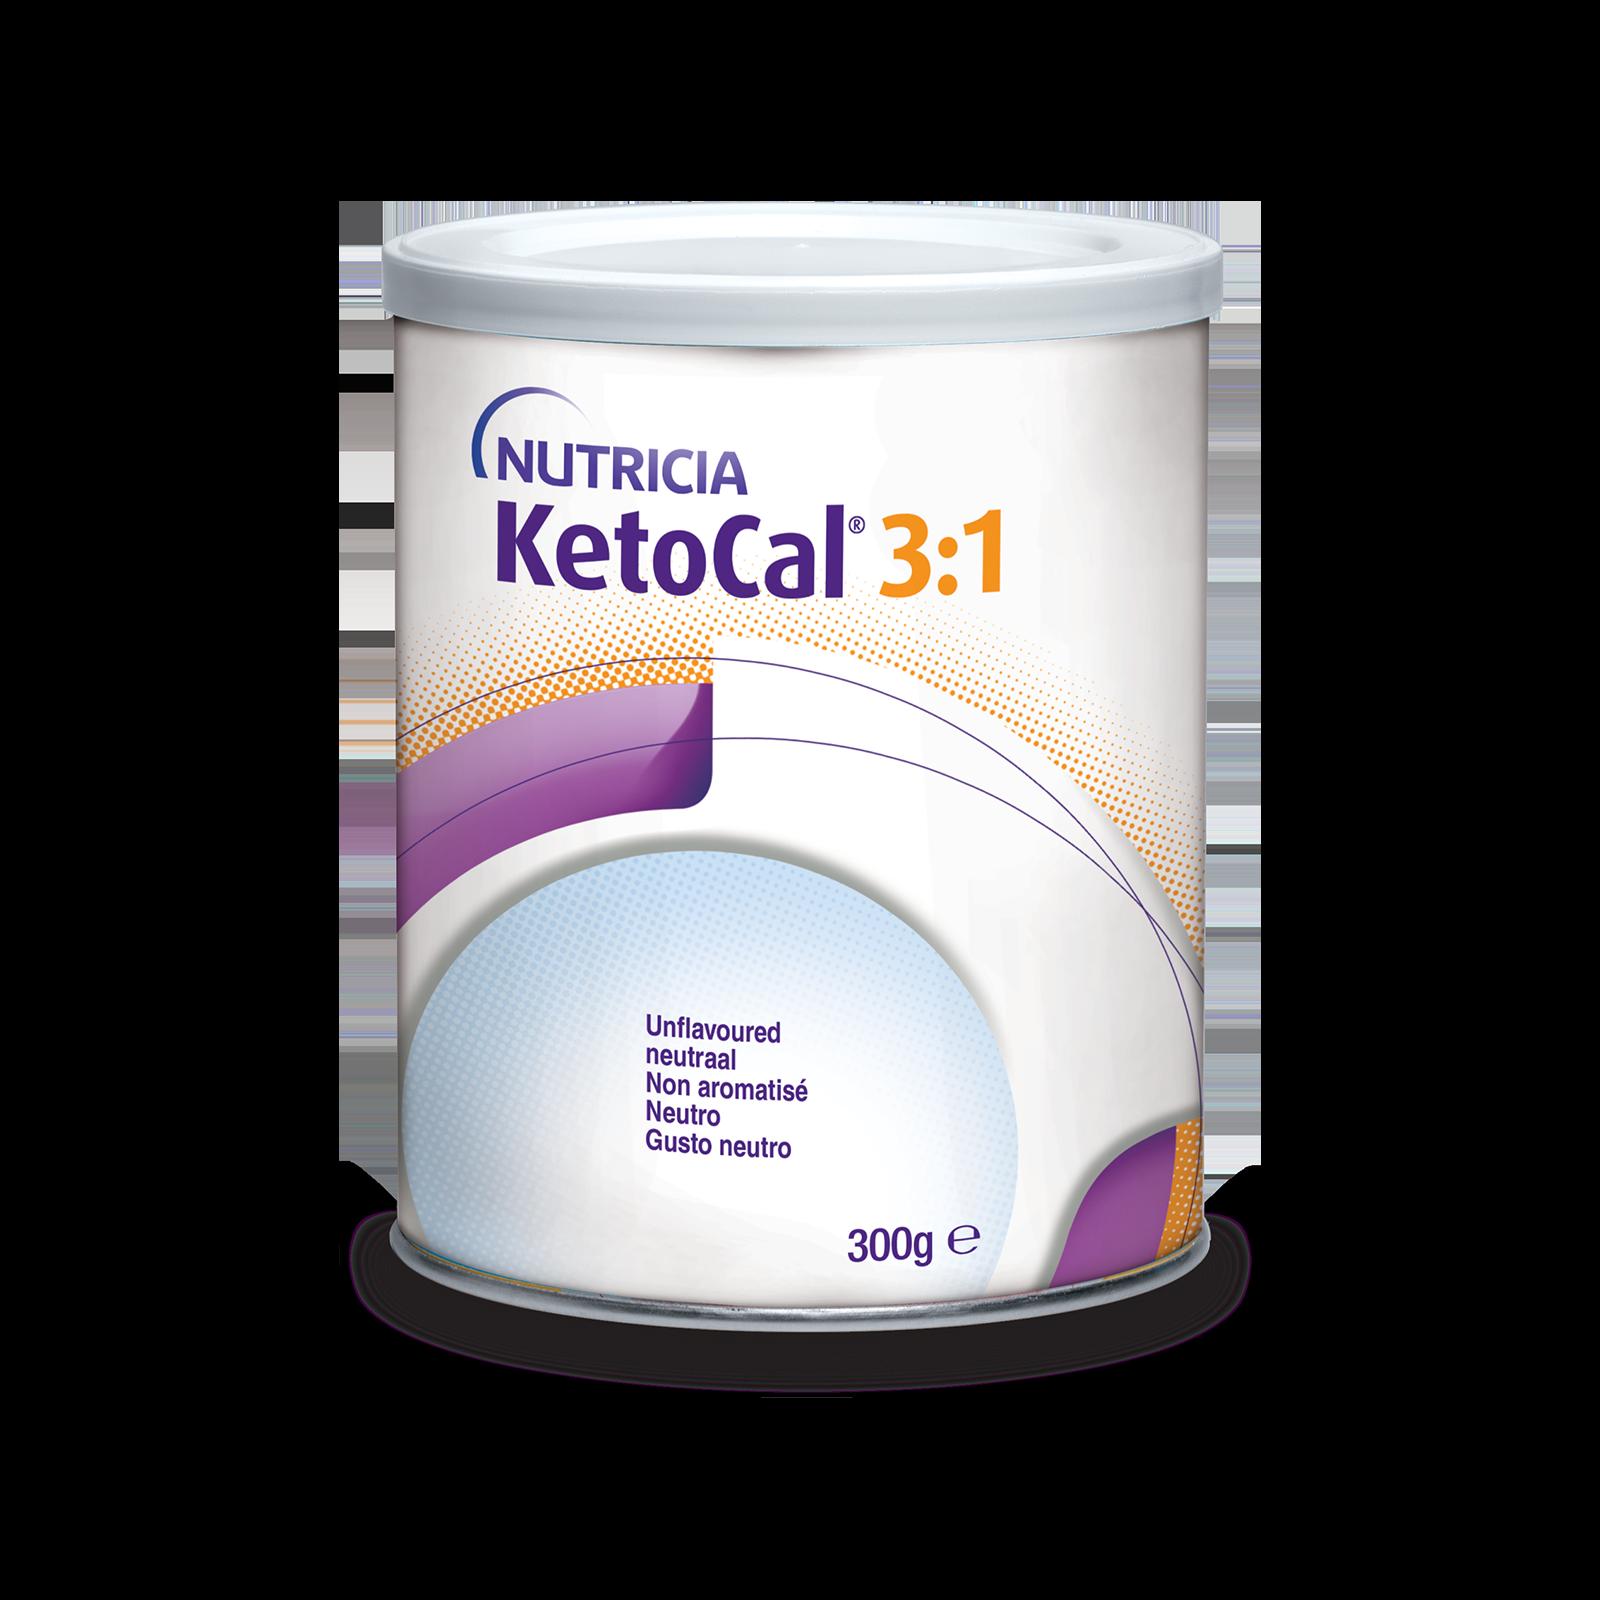 Ketocal 3:1 Barattolo da 300 g | Nutricia